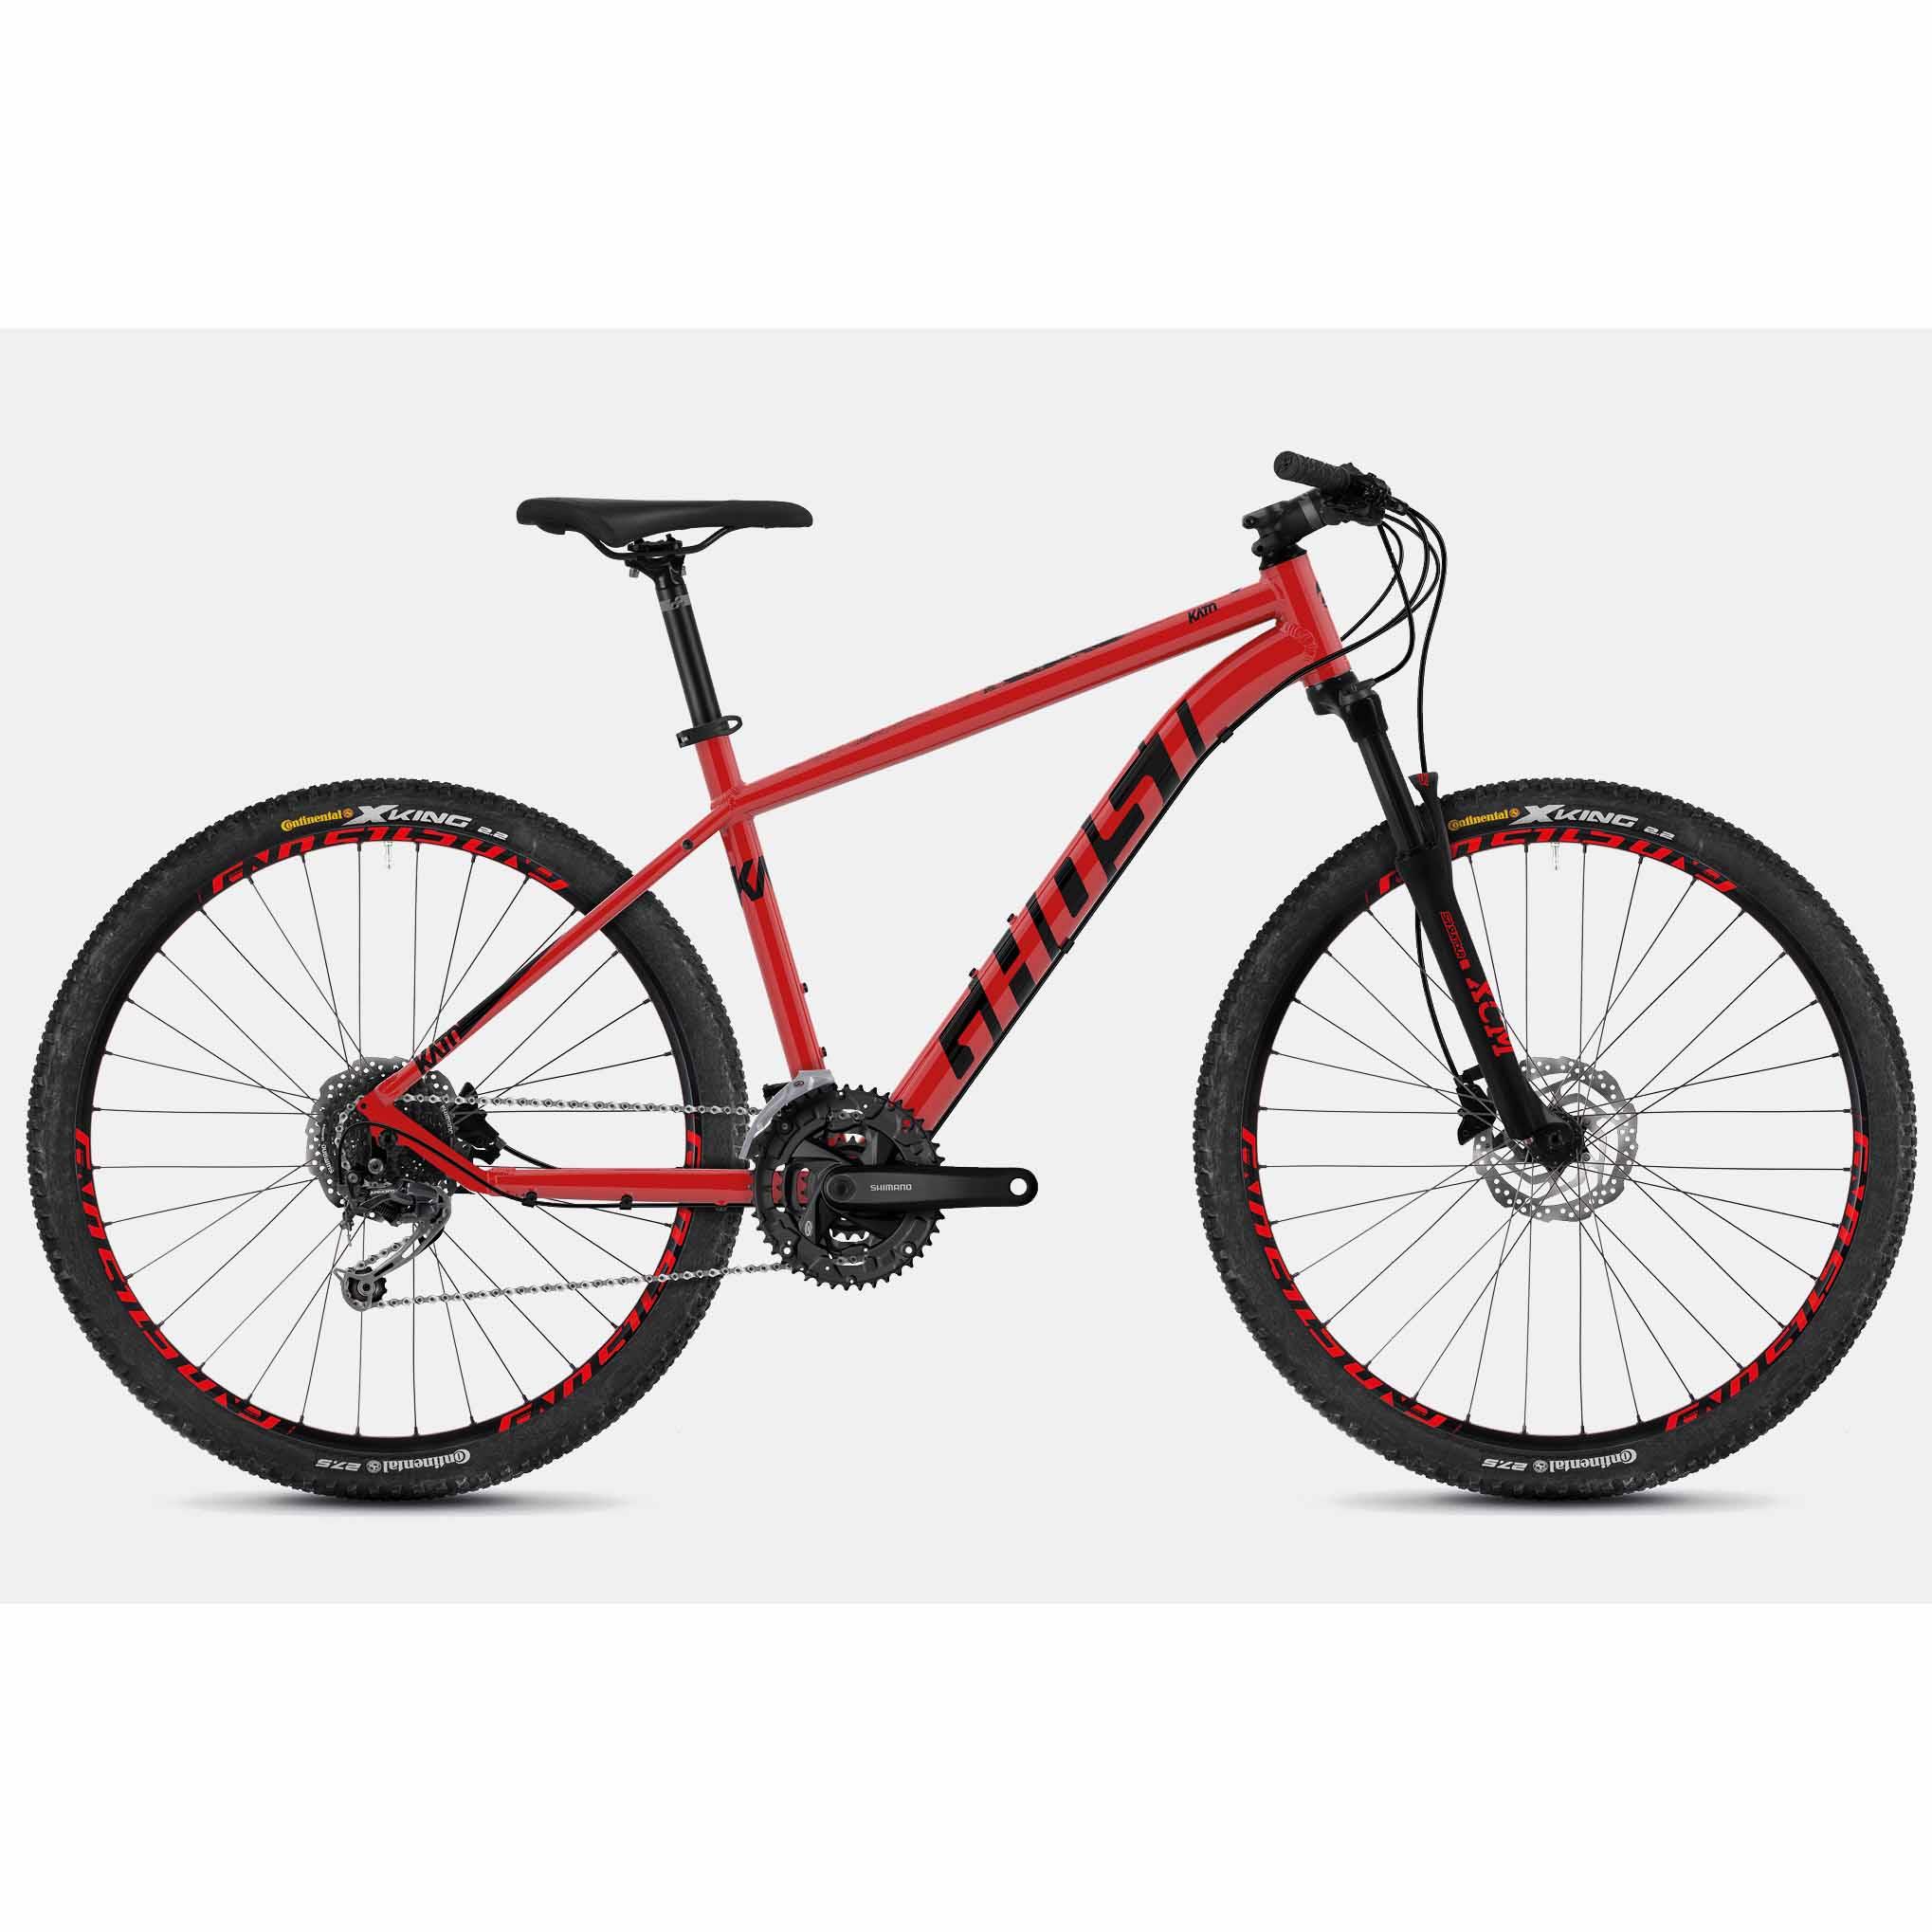 Фото Велосипед Ghost Kato 4.7 27.5″ , рама M, красно-черный,2019